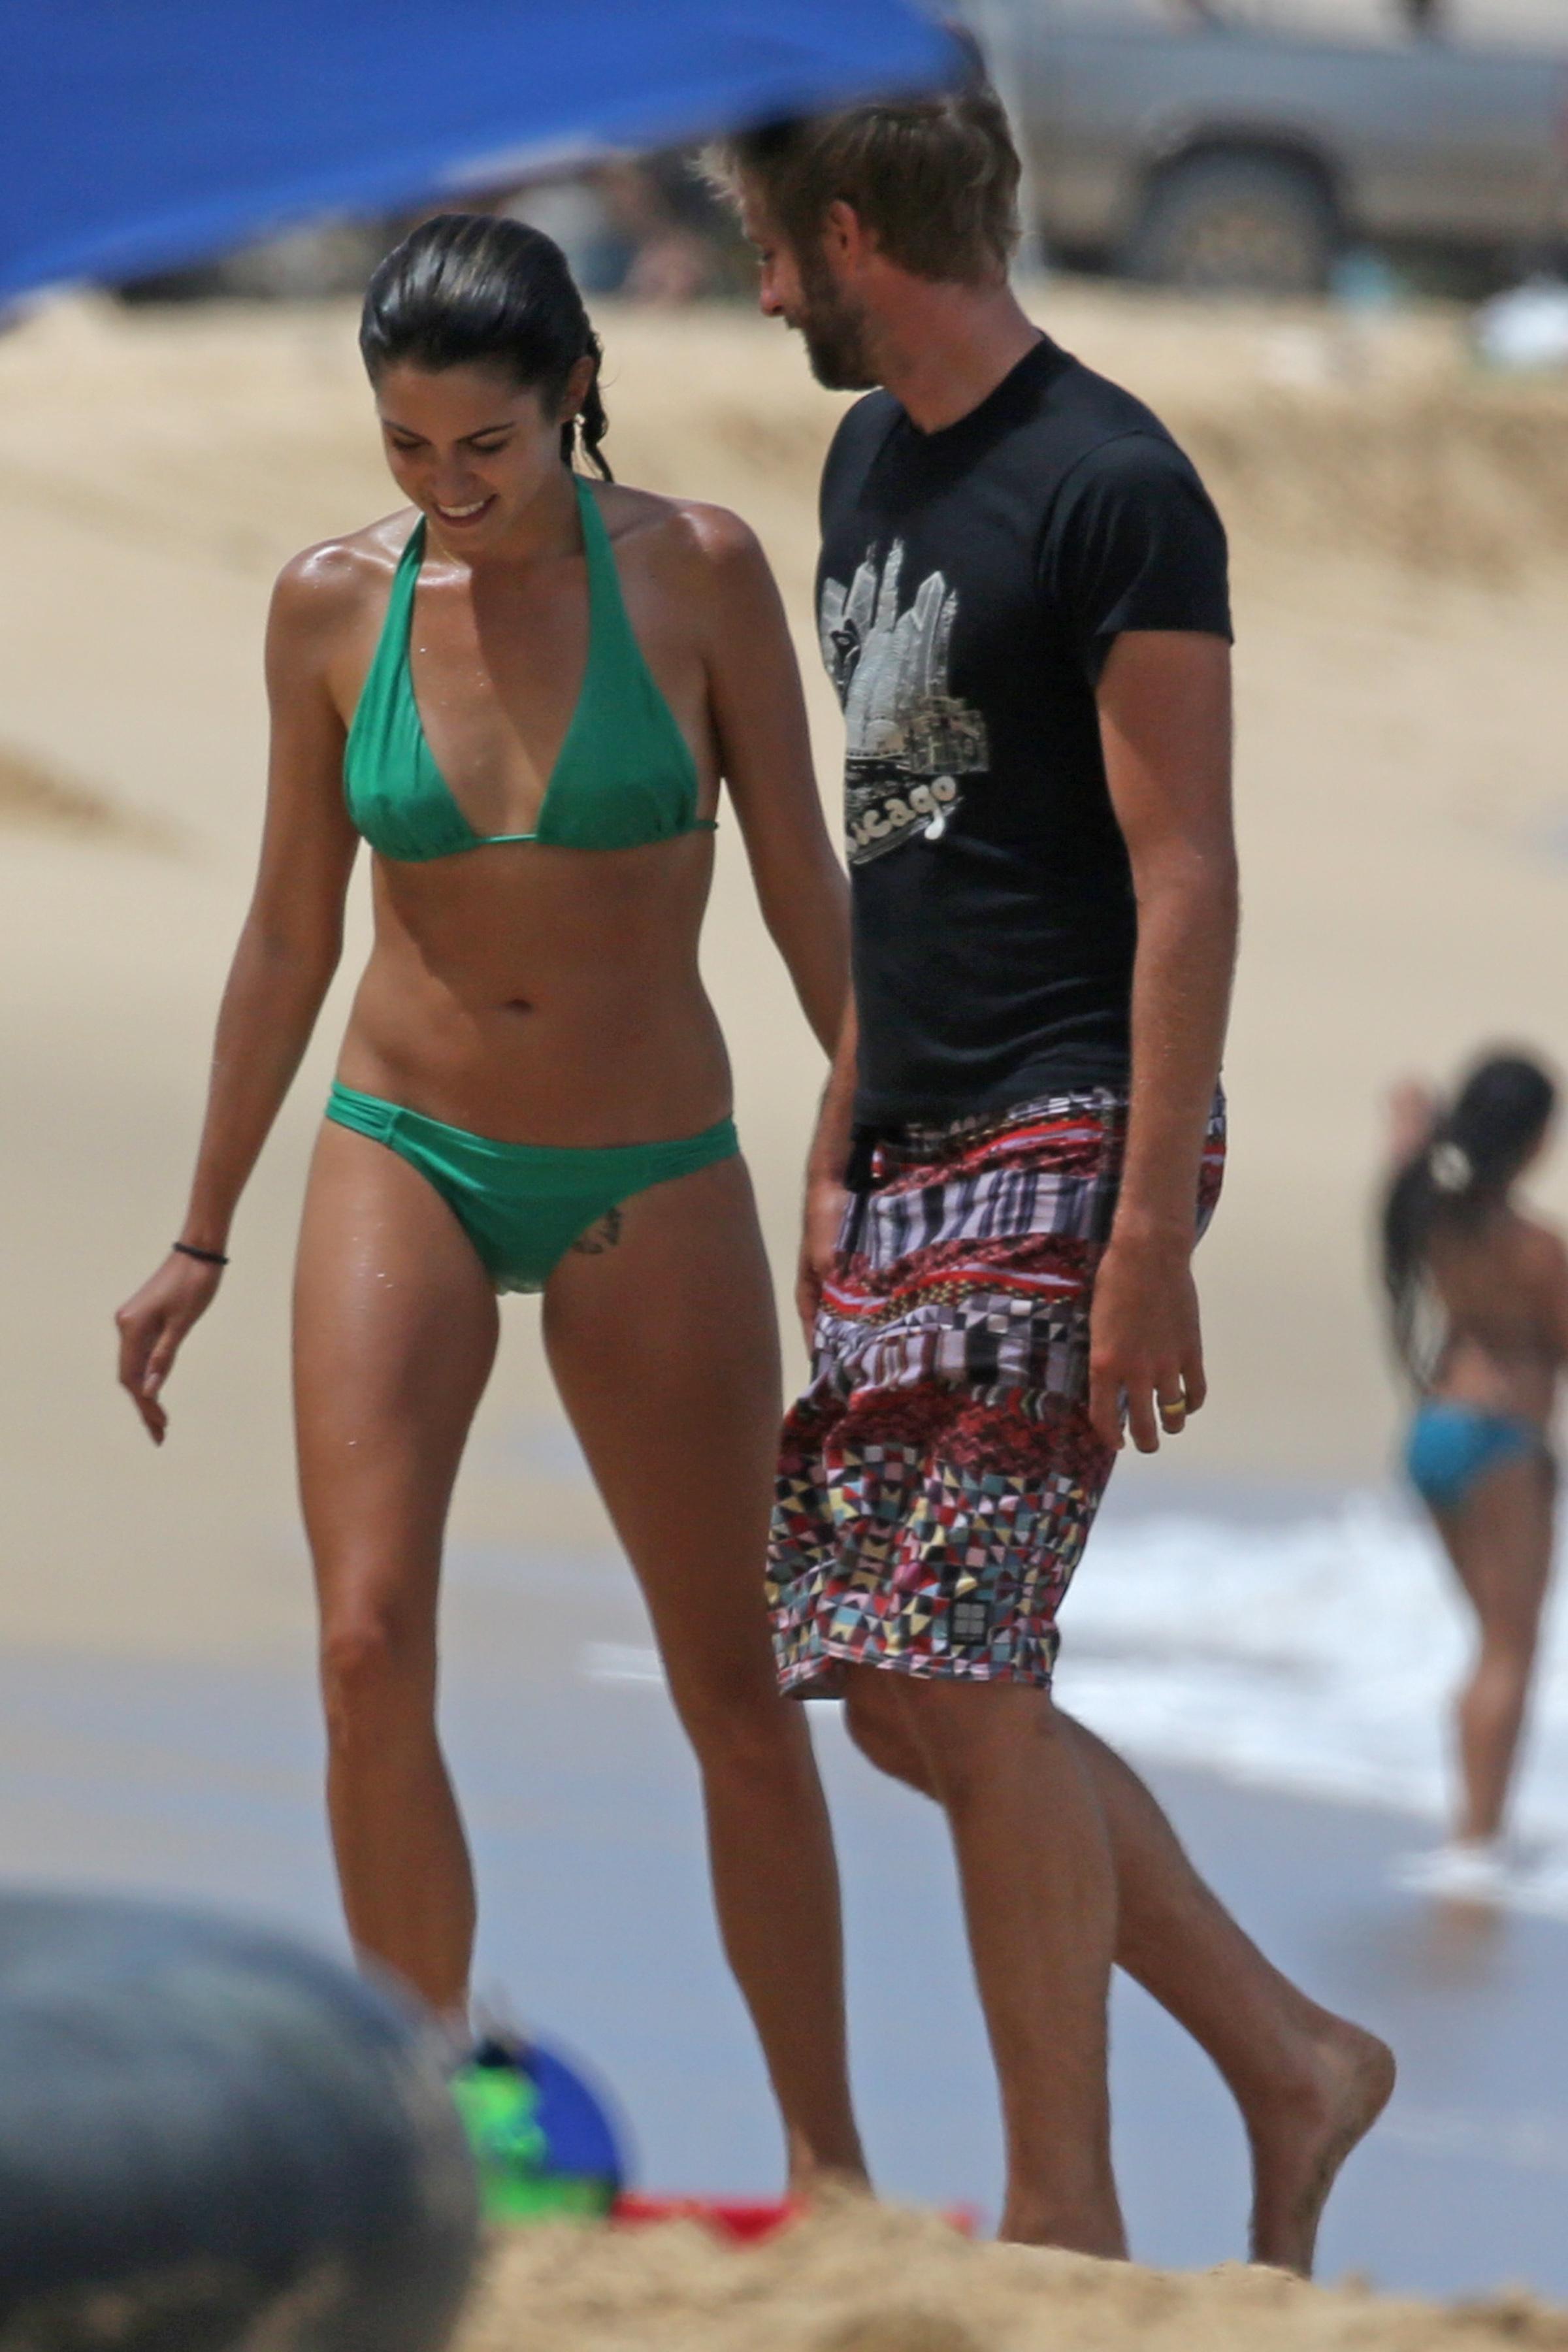 746031157_Nikki_Reed_on_the_Beach_in_Hawaii10_122_473lo.jpg